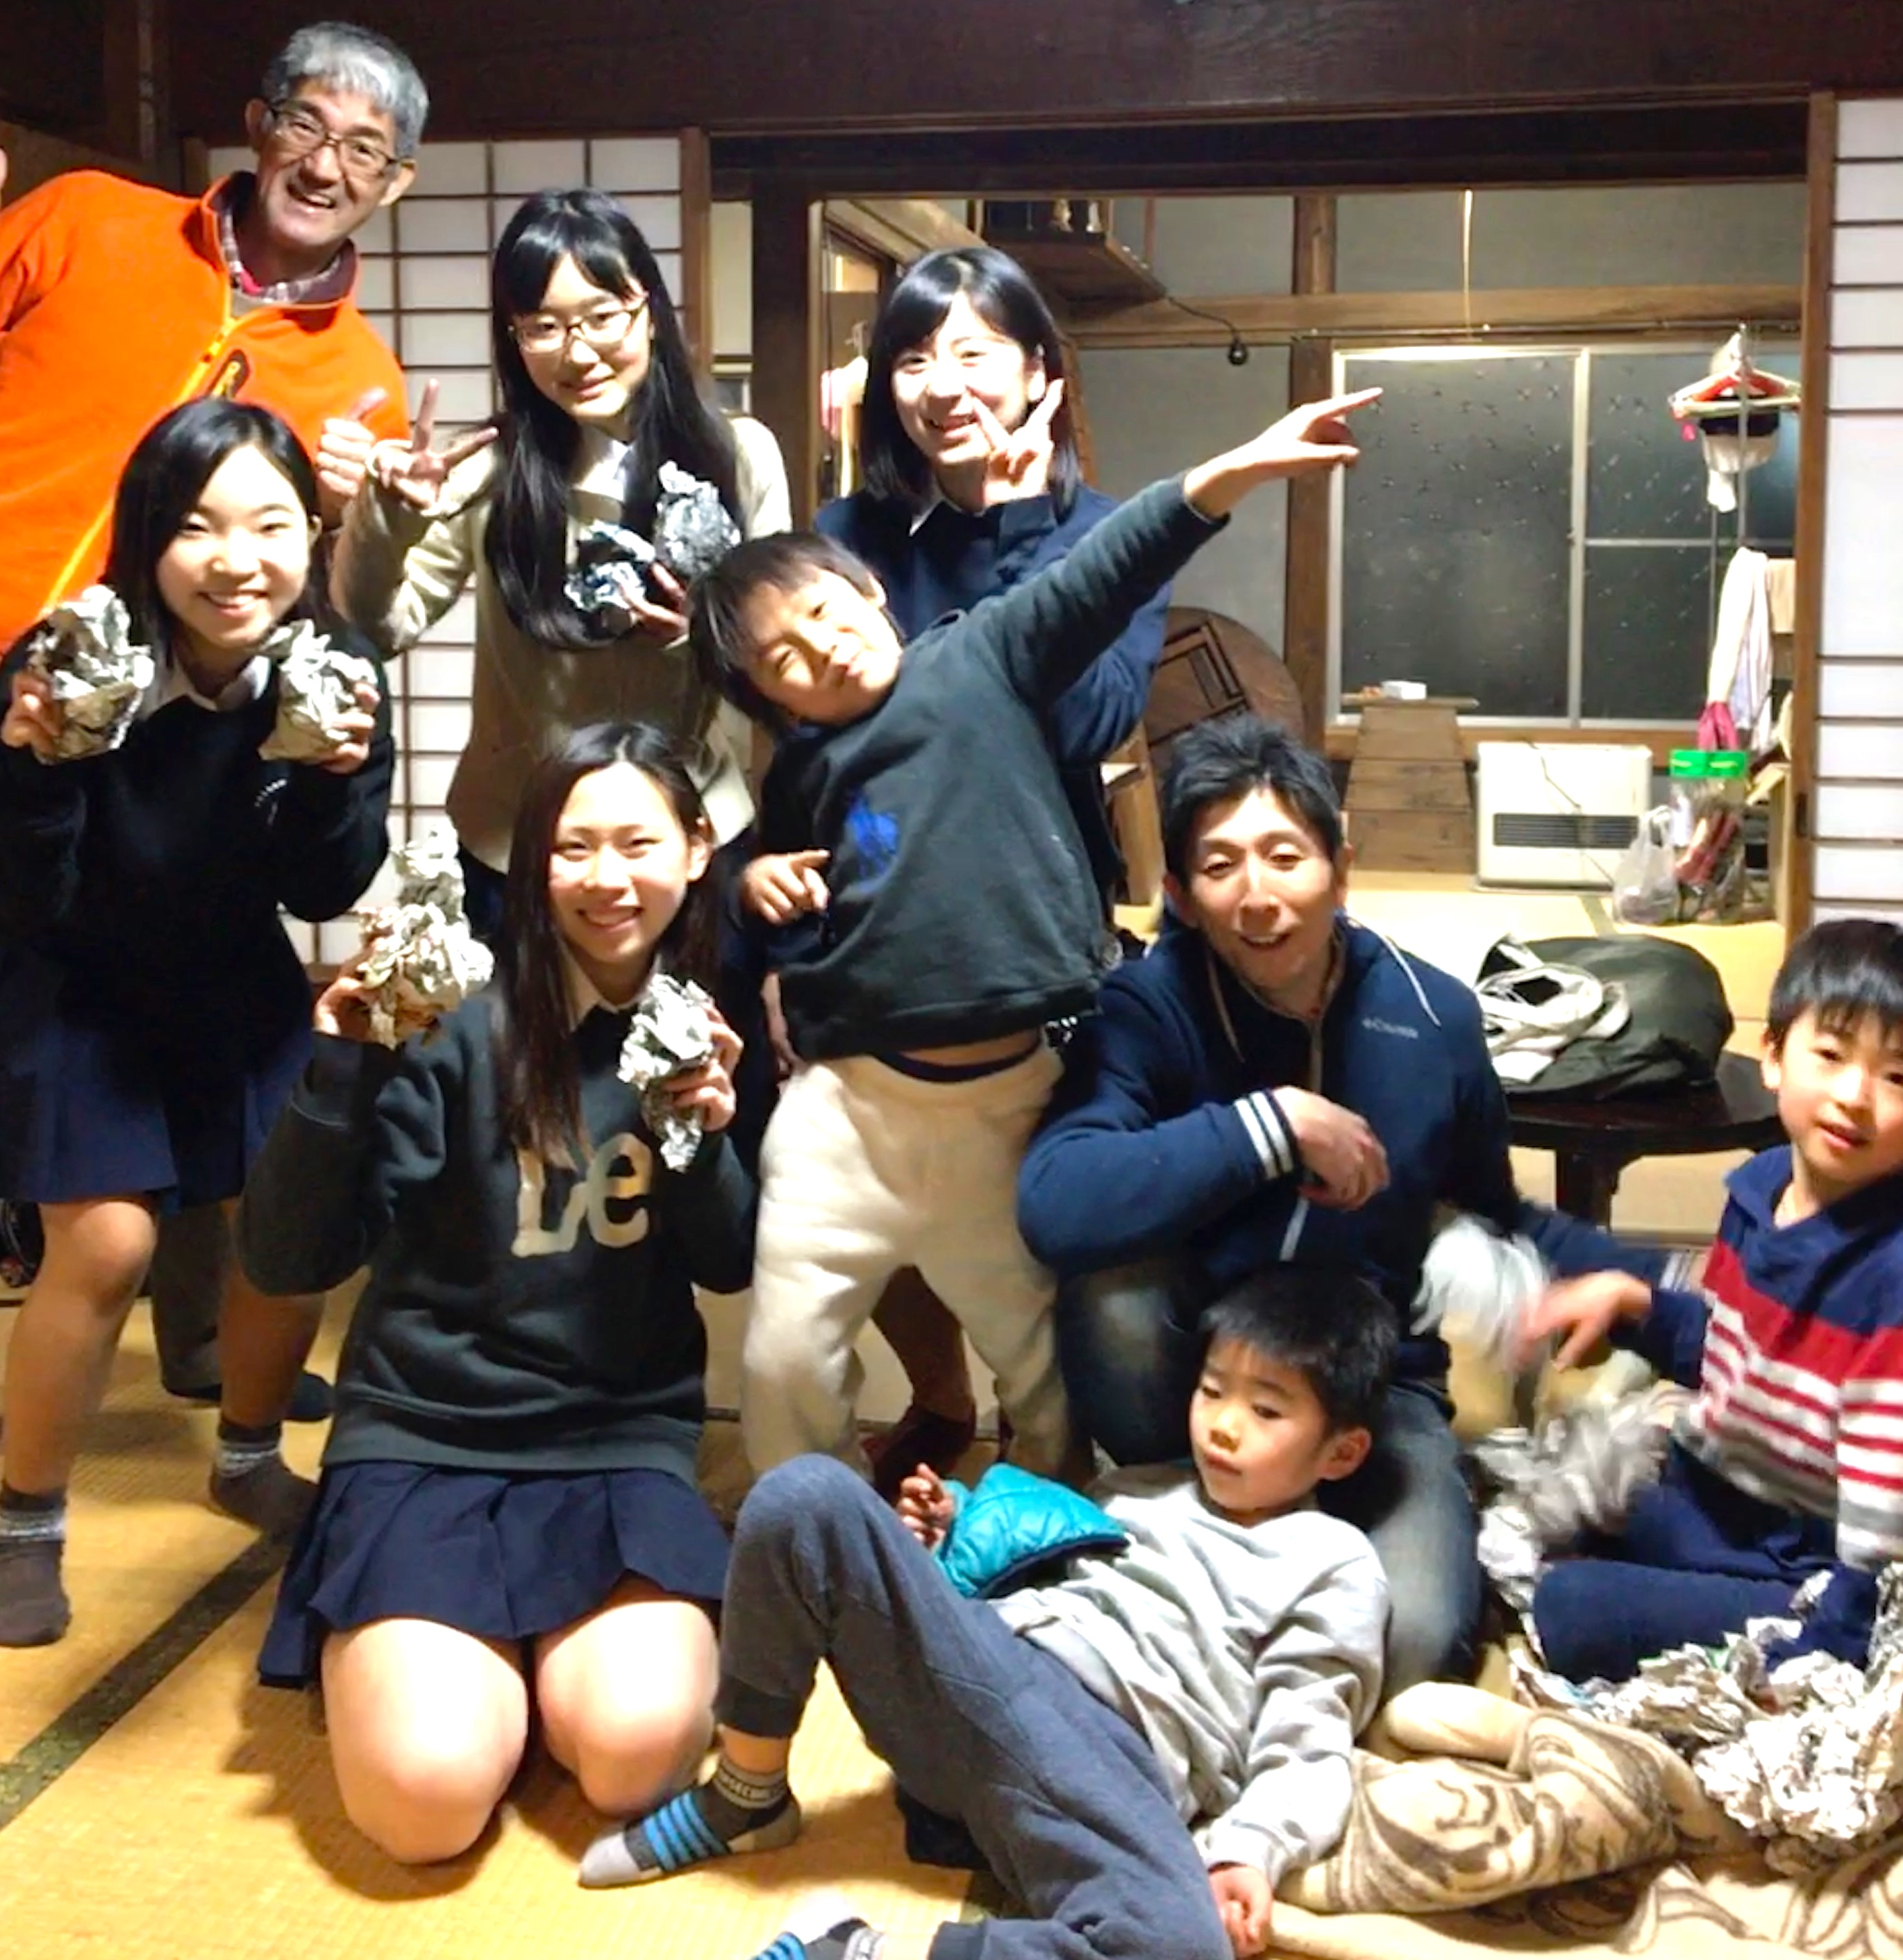 Boat meets Girls 〜逗子高の女子学生がボートに遊びに来てくれました